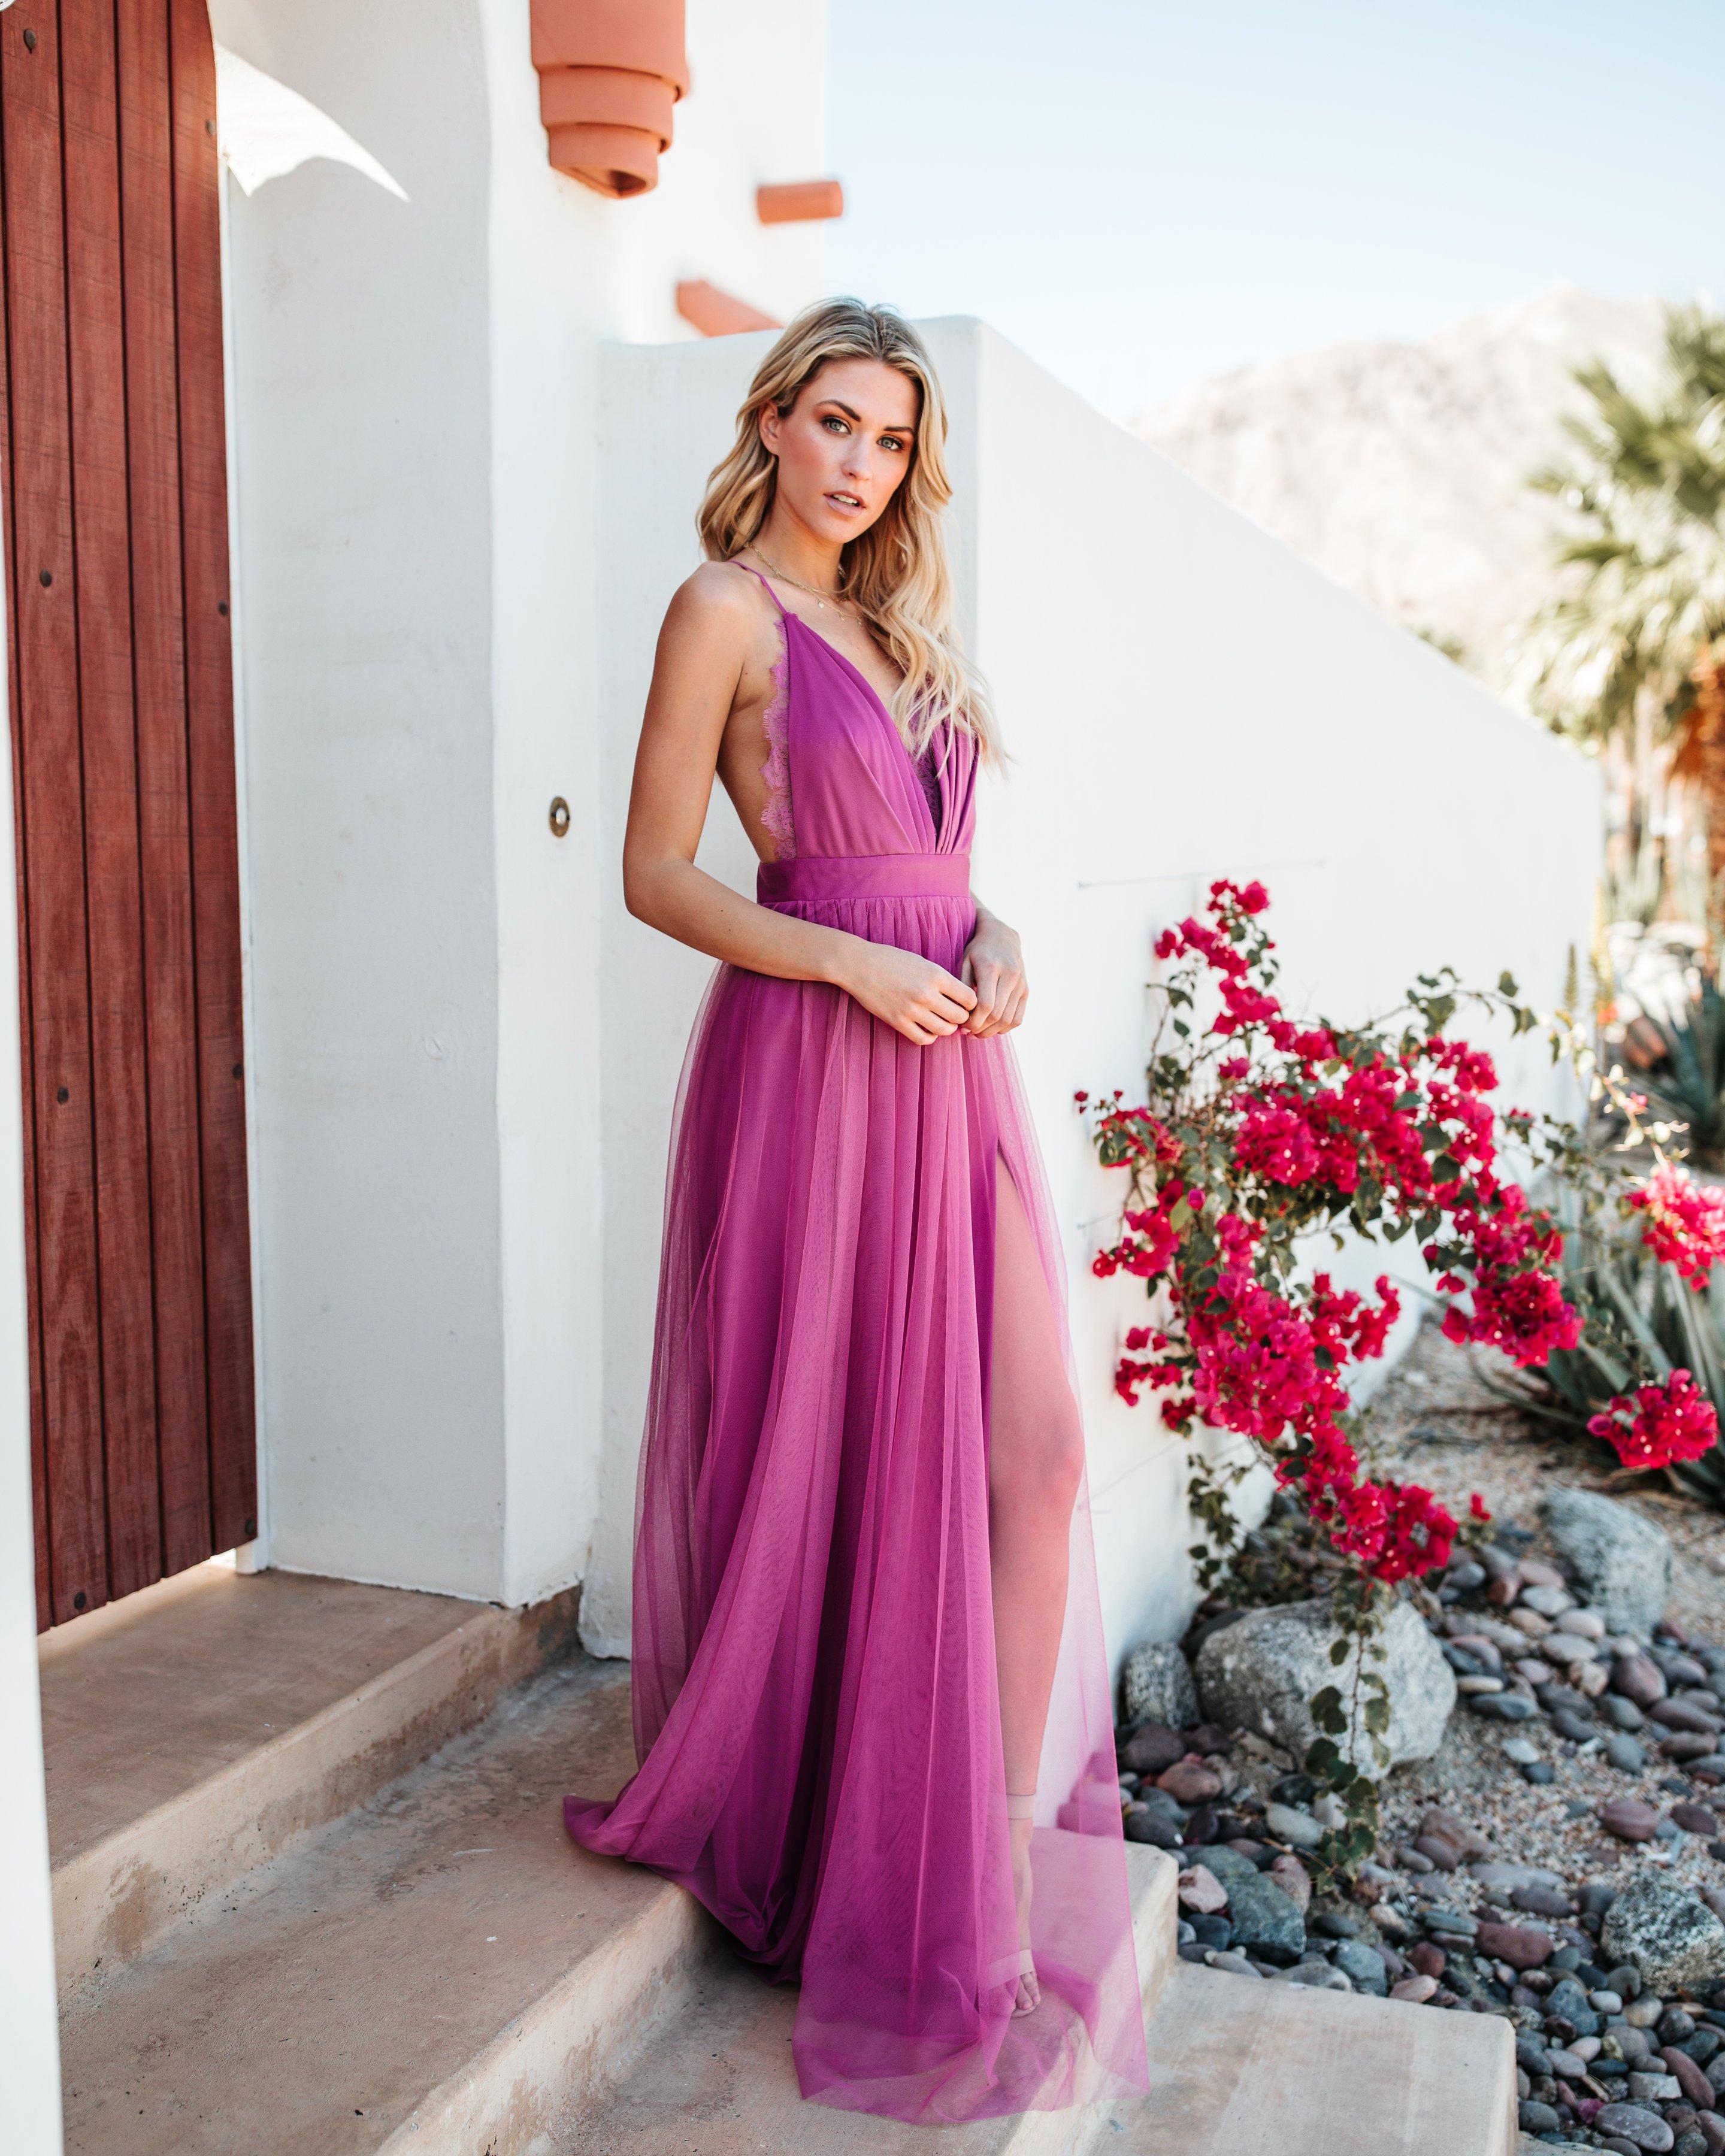 Maxi Dress Wedding Dresses Gorgeous Maxi Dresses [ 3600 x 2880 Pixel ]